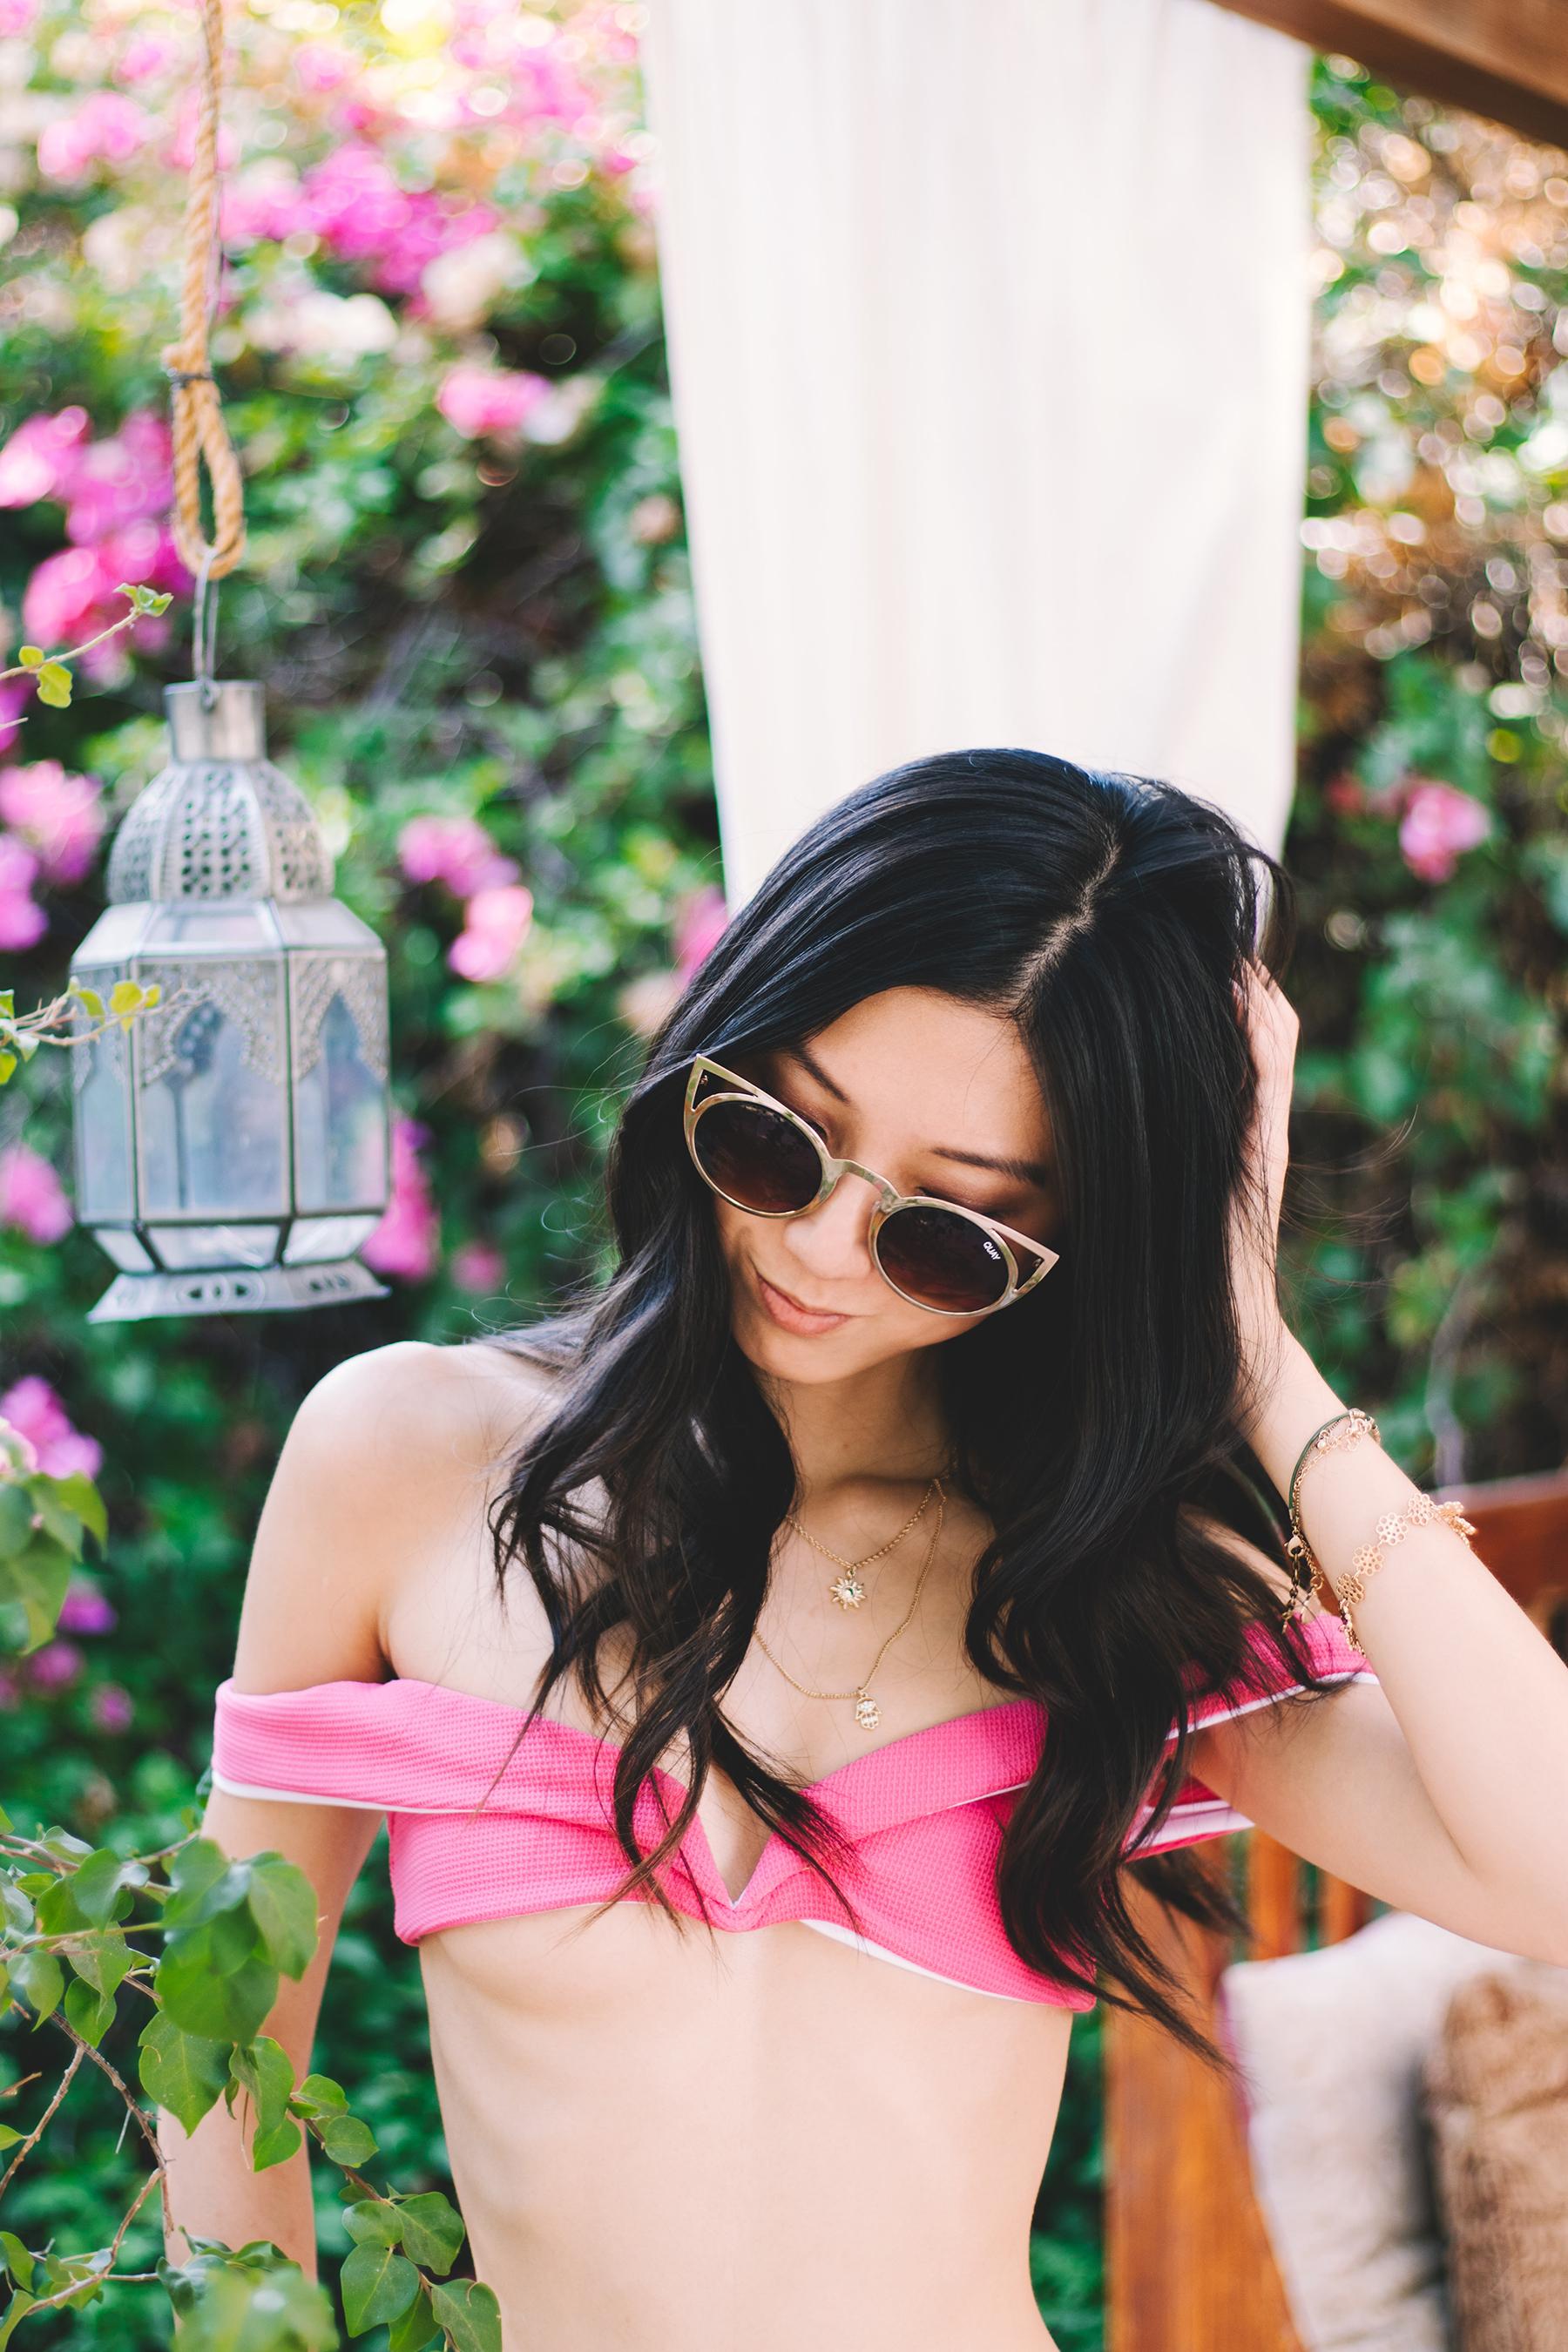 Diana Huntley - Champagne Twilight - Palm Springs - Skye And Staghorn Swimwear